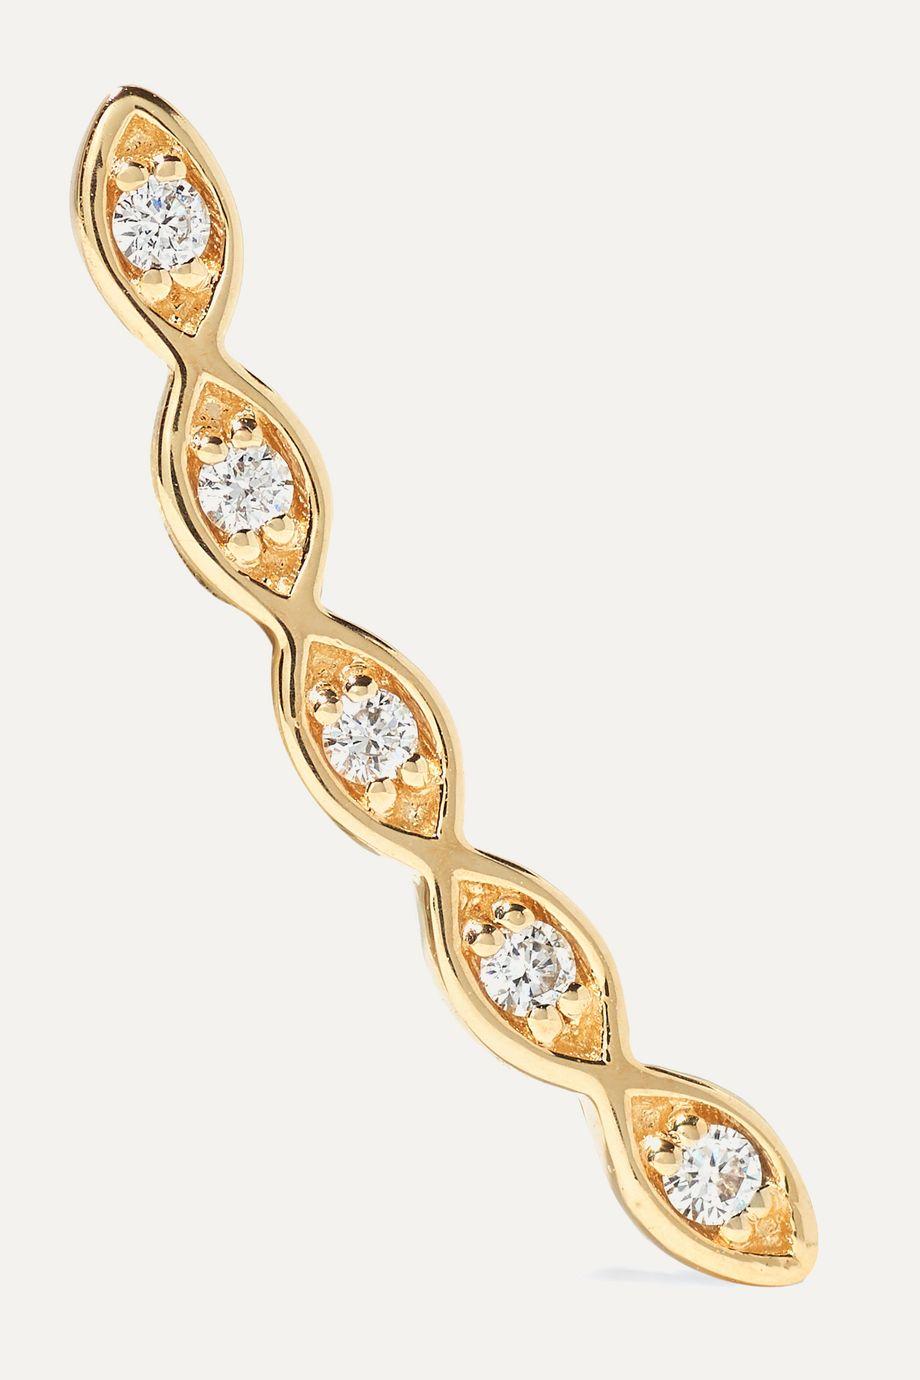 Sydney Evan Evil Eye 14-karat gold diamond earring